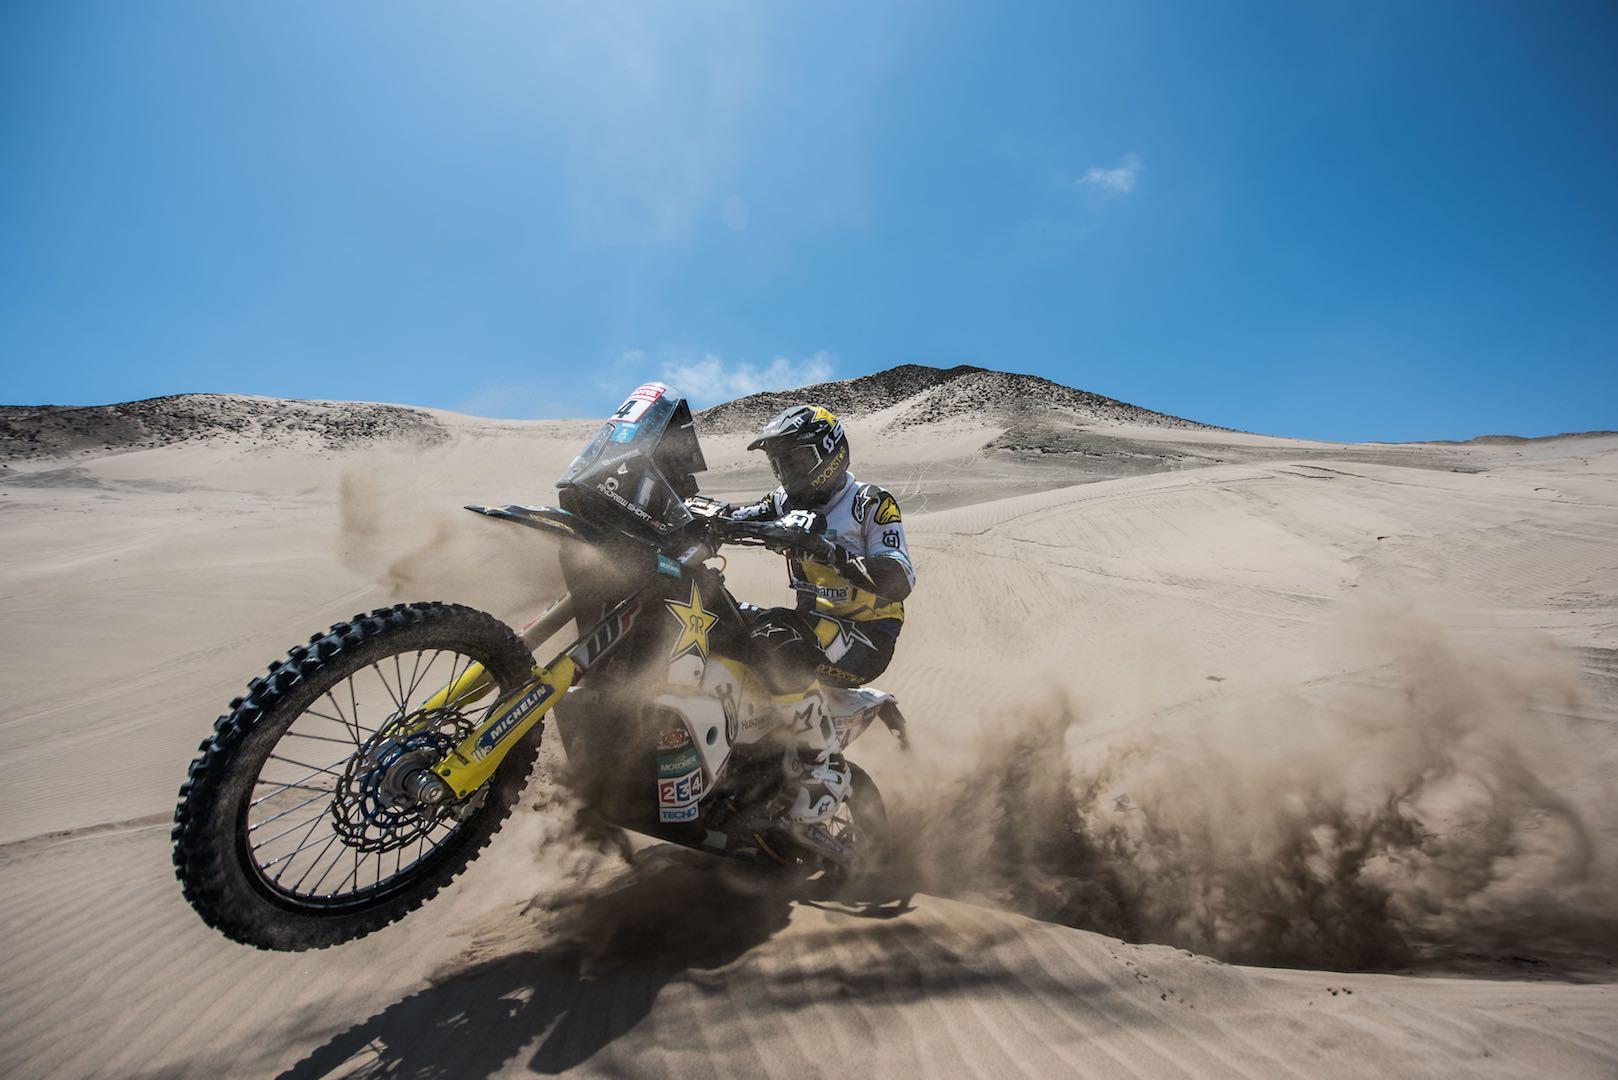 2018 Dakar Rally Motorcycle Preview: Husqvarna's Andrew Short